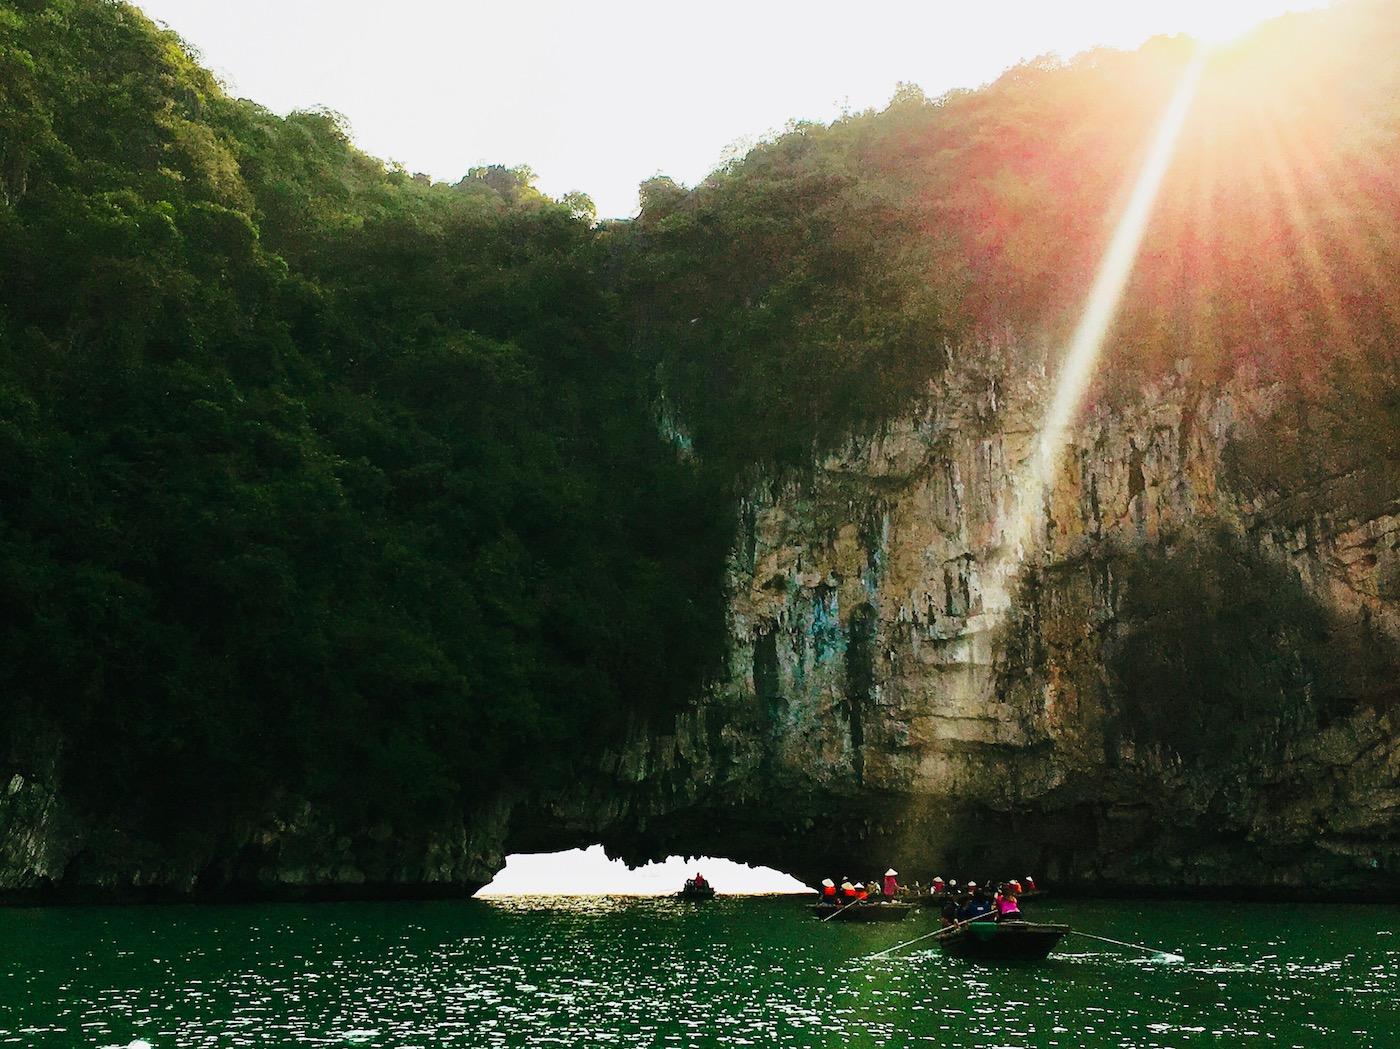 Passeio de fim de tarde, Indochina Junk. Foto: Patti Neves